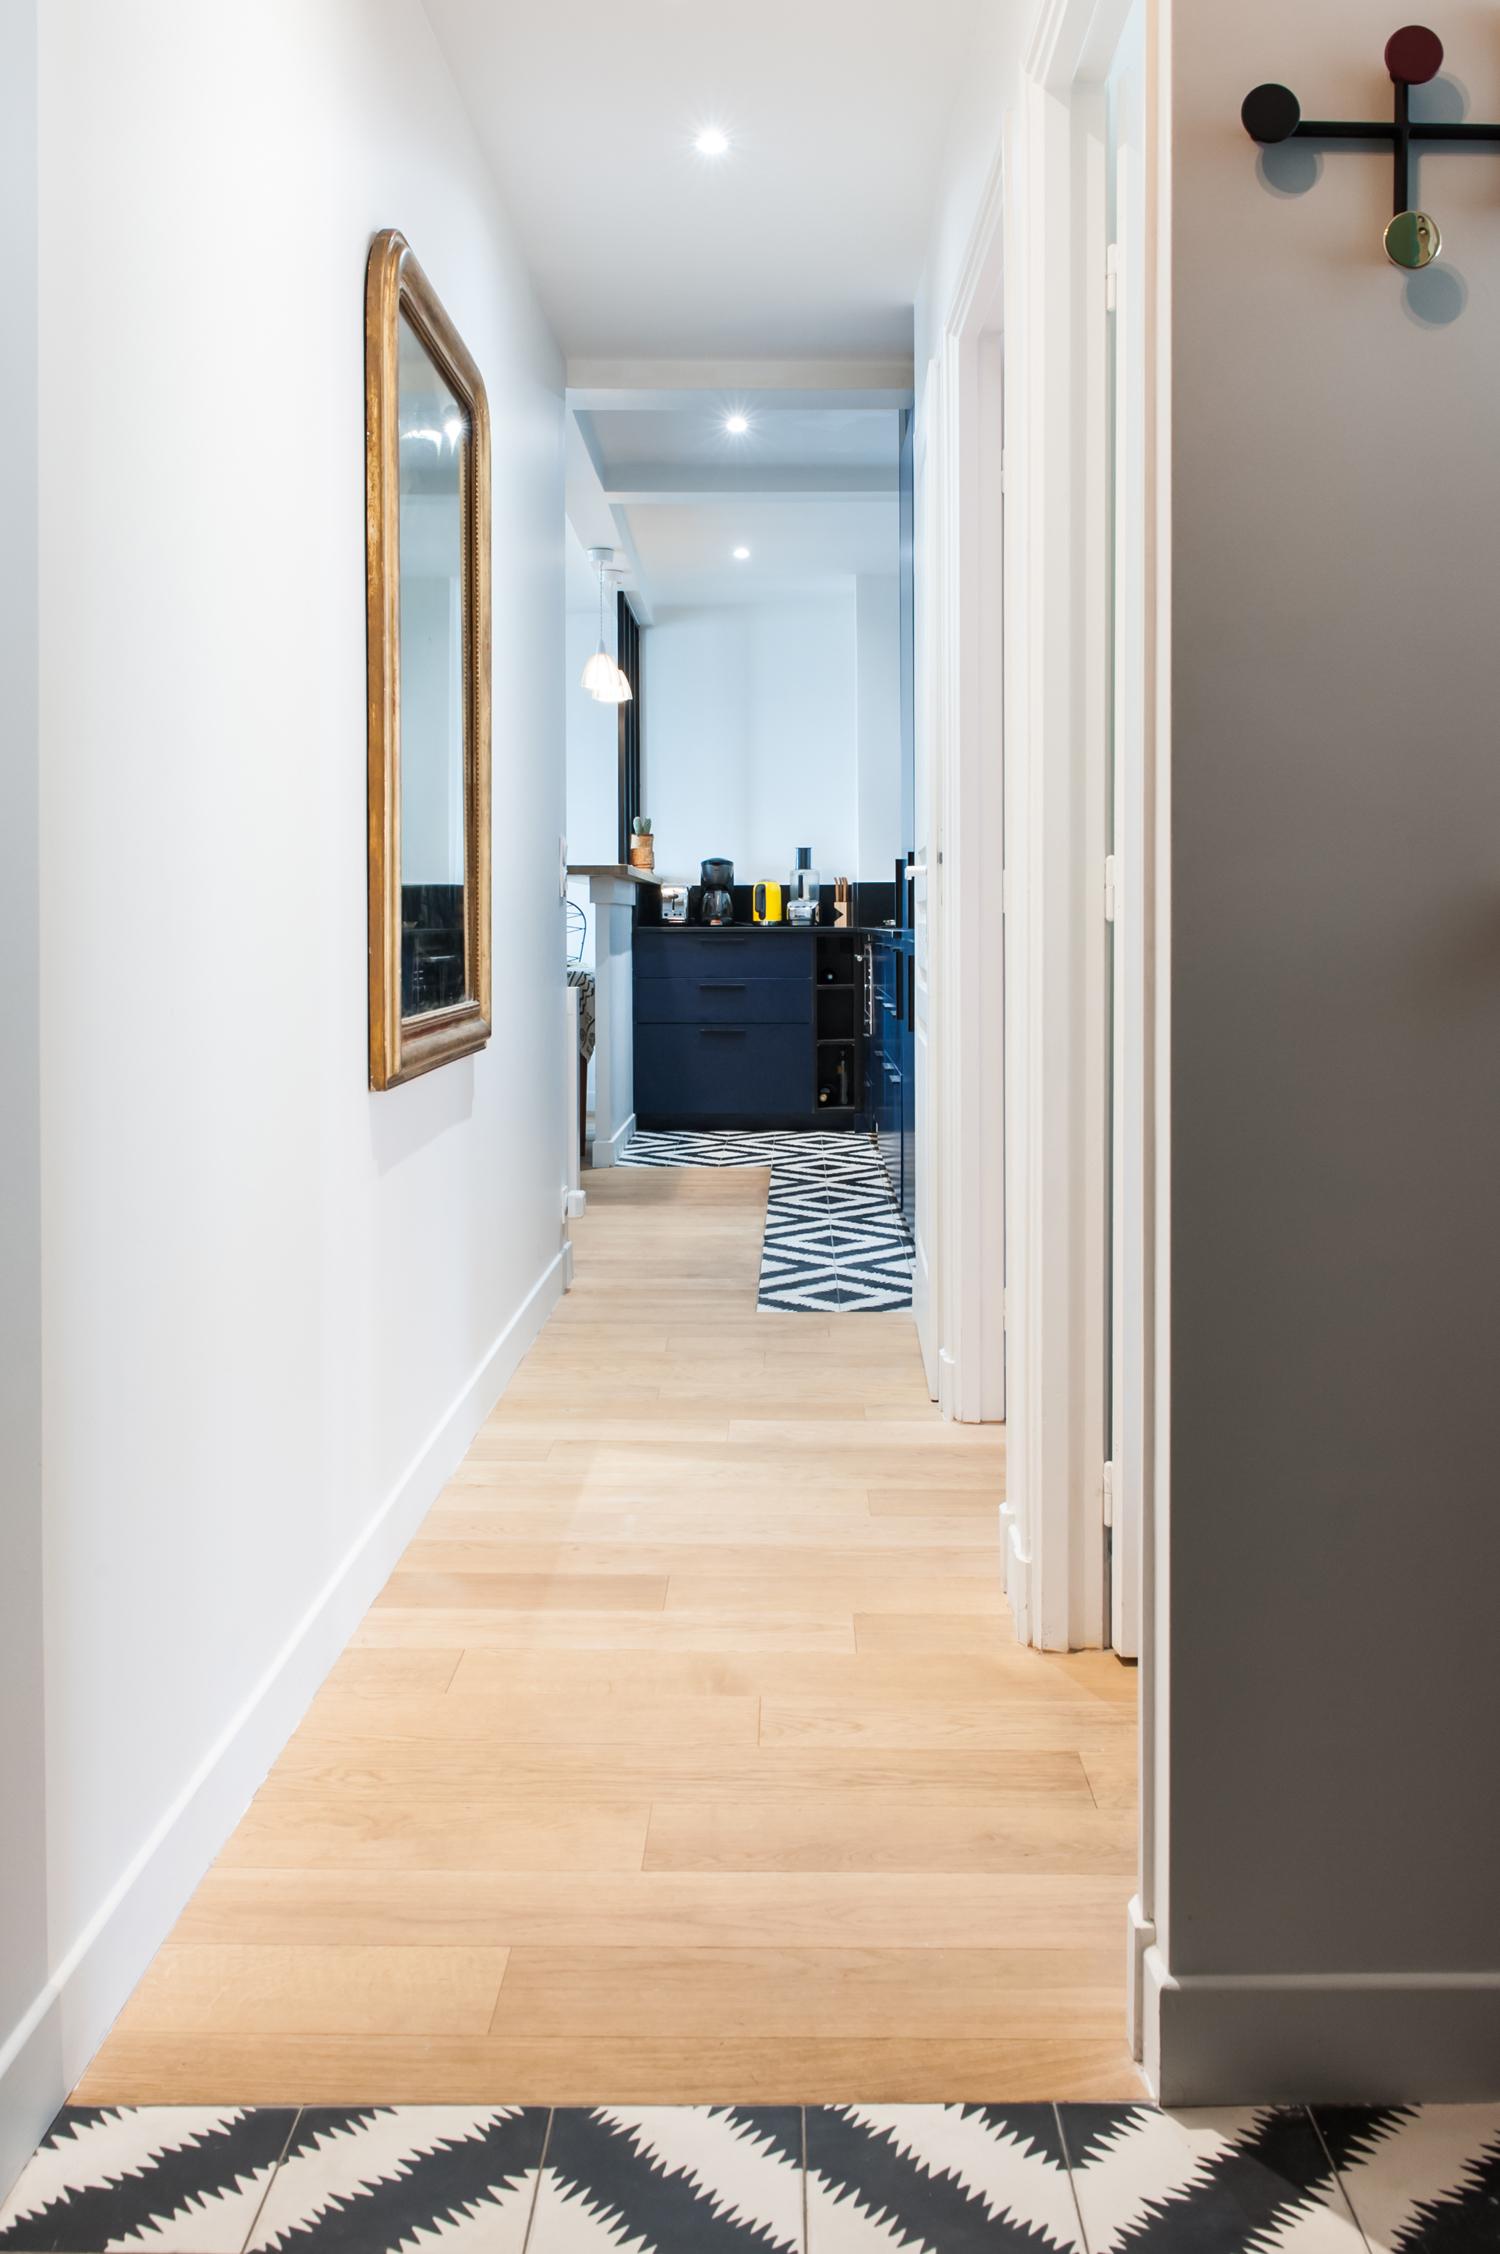 FG_2018_06_Appartement-9e-2